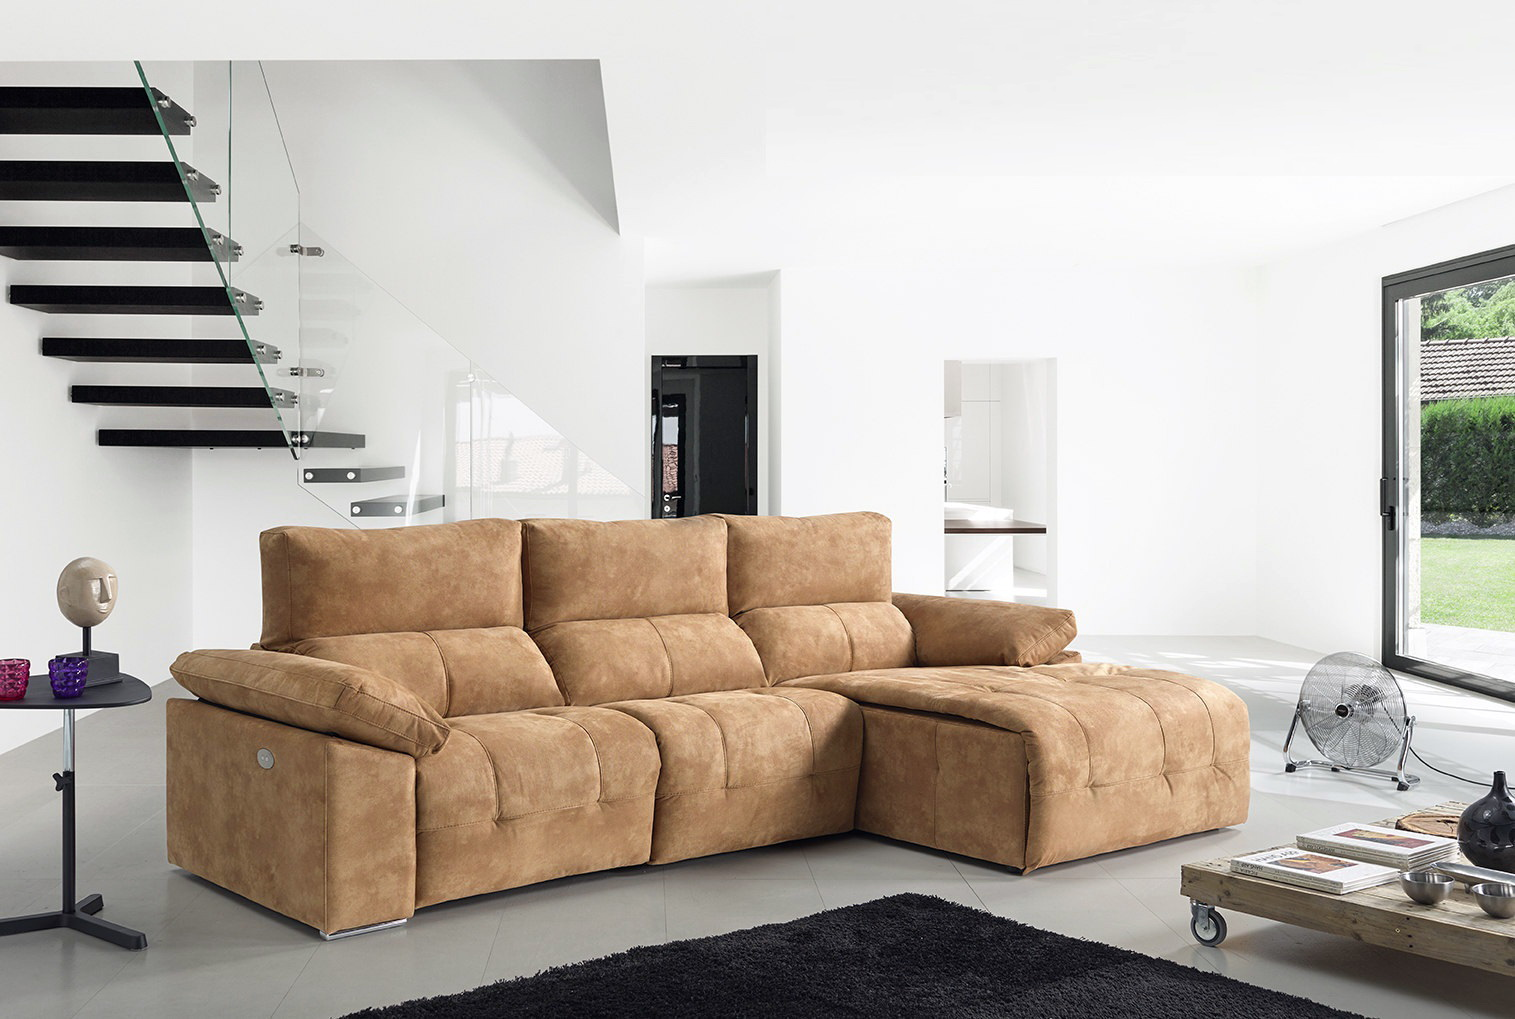 Shire sof modular relax motorizado by vizca no tapizados - Muebles en leon ...